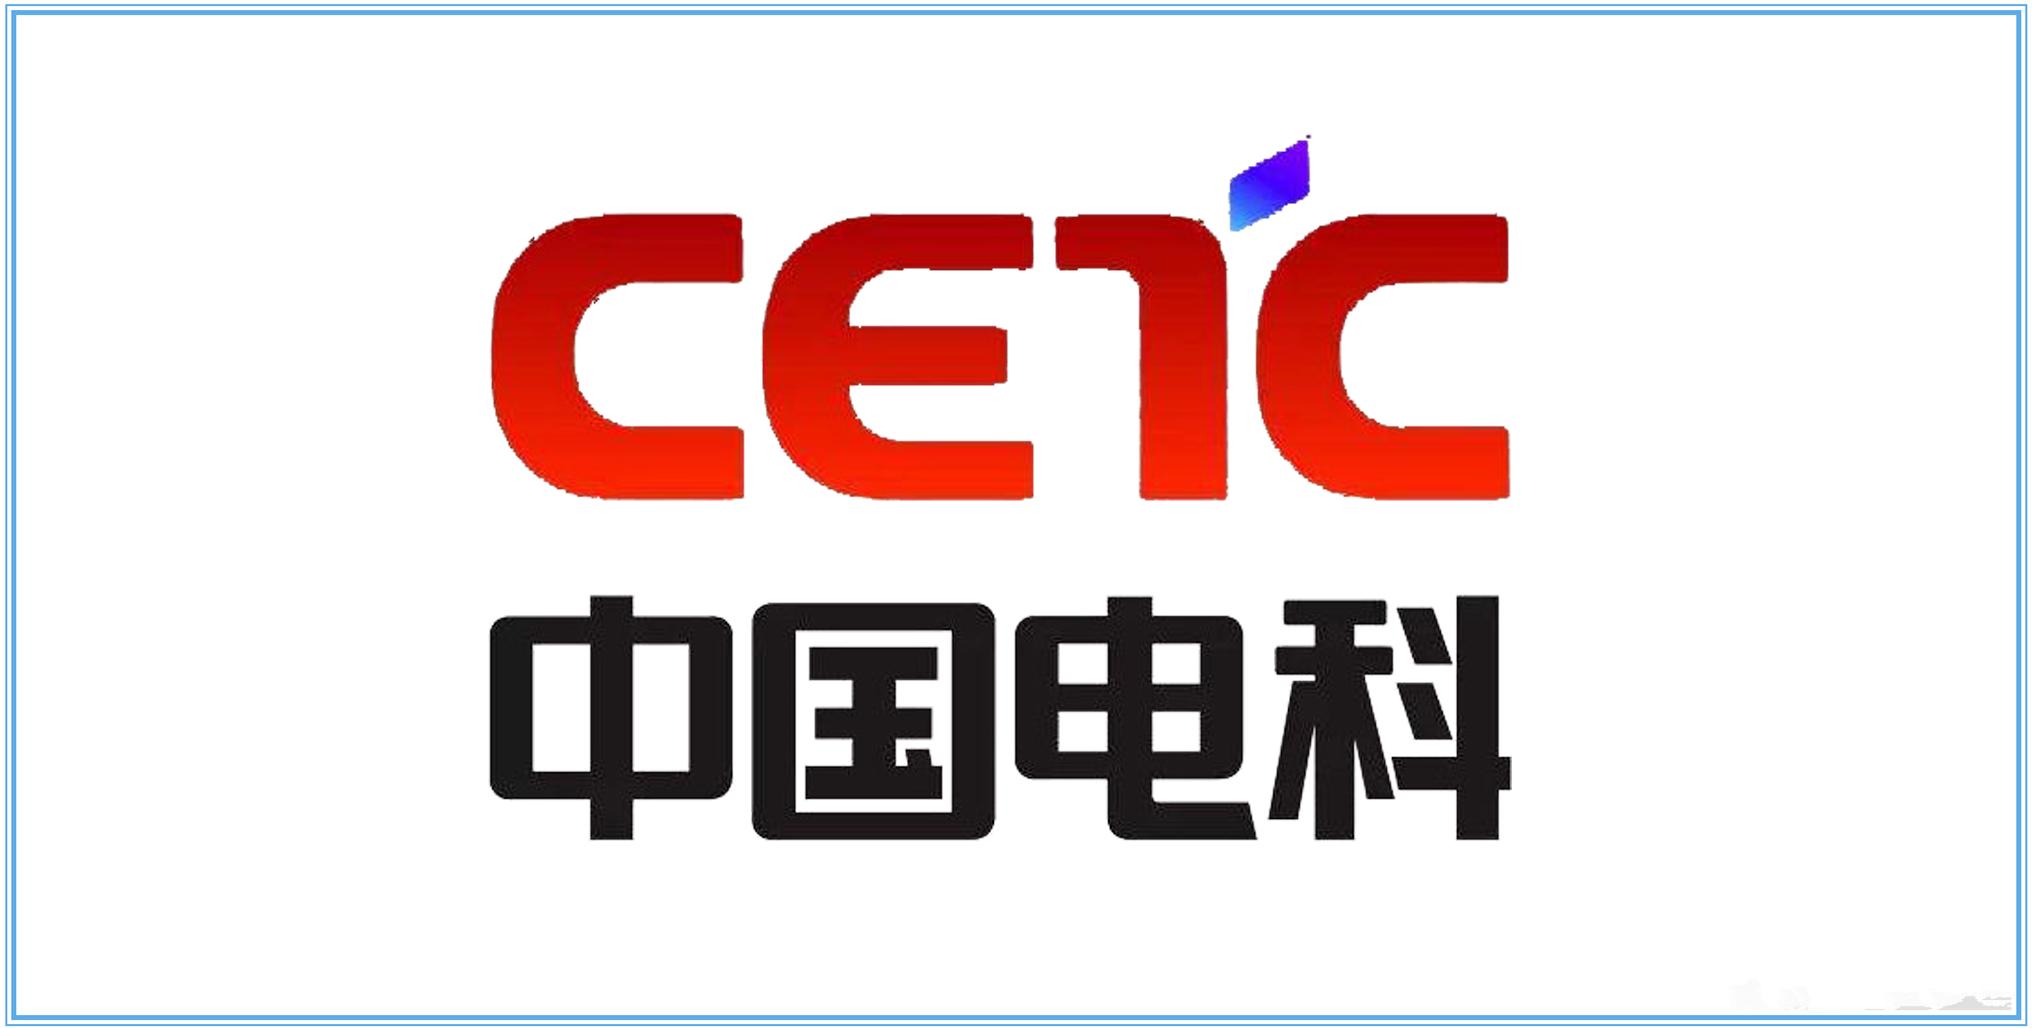 "<div style=""text-align:center;""> 中國電科 </div>"